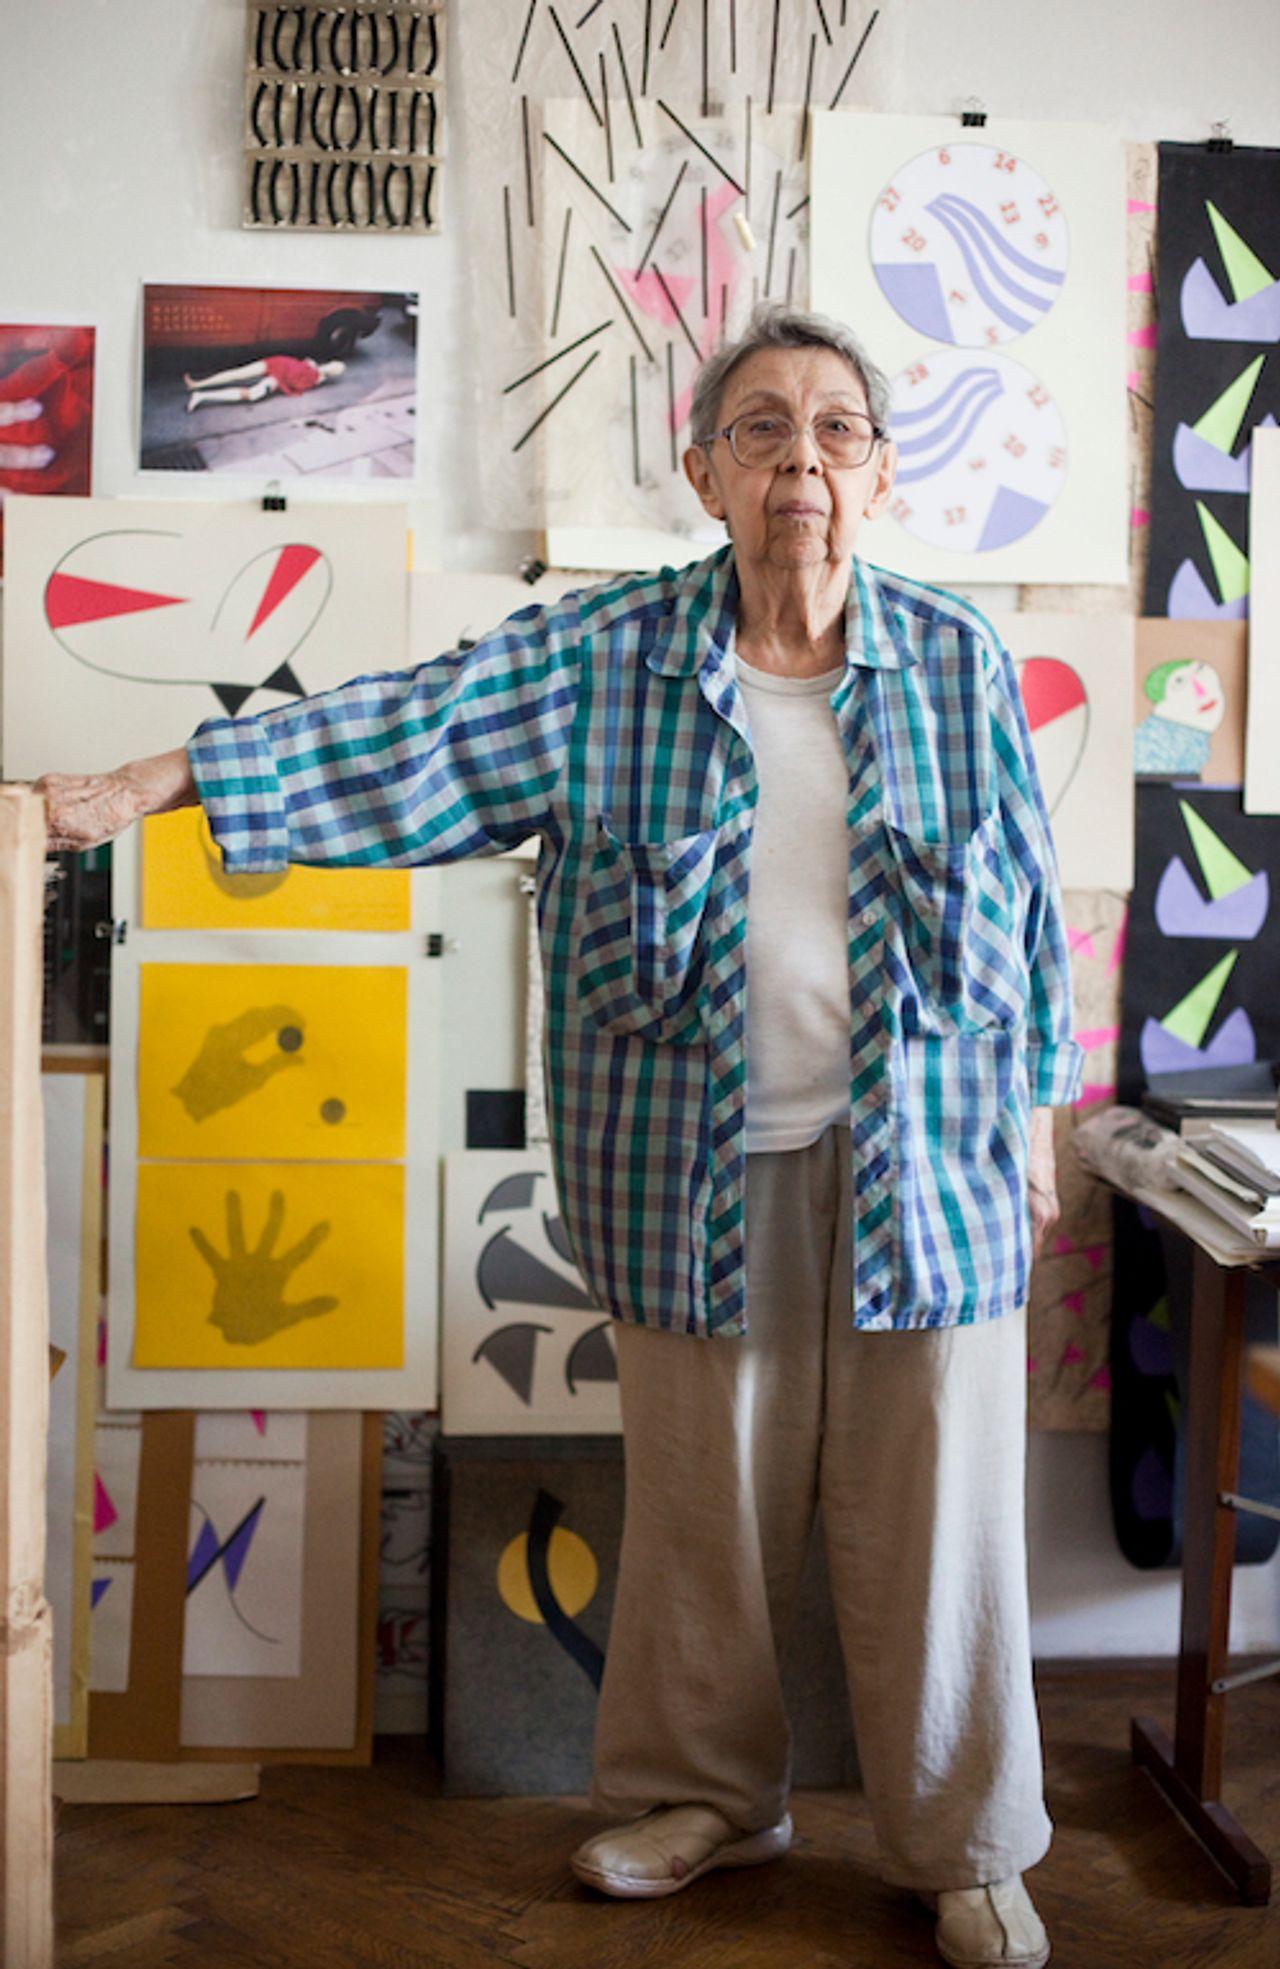 Geta Brătescu in her studio, where she continued to work every day Photo: Stefan Sava